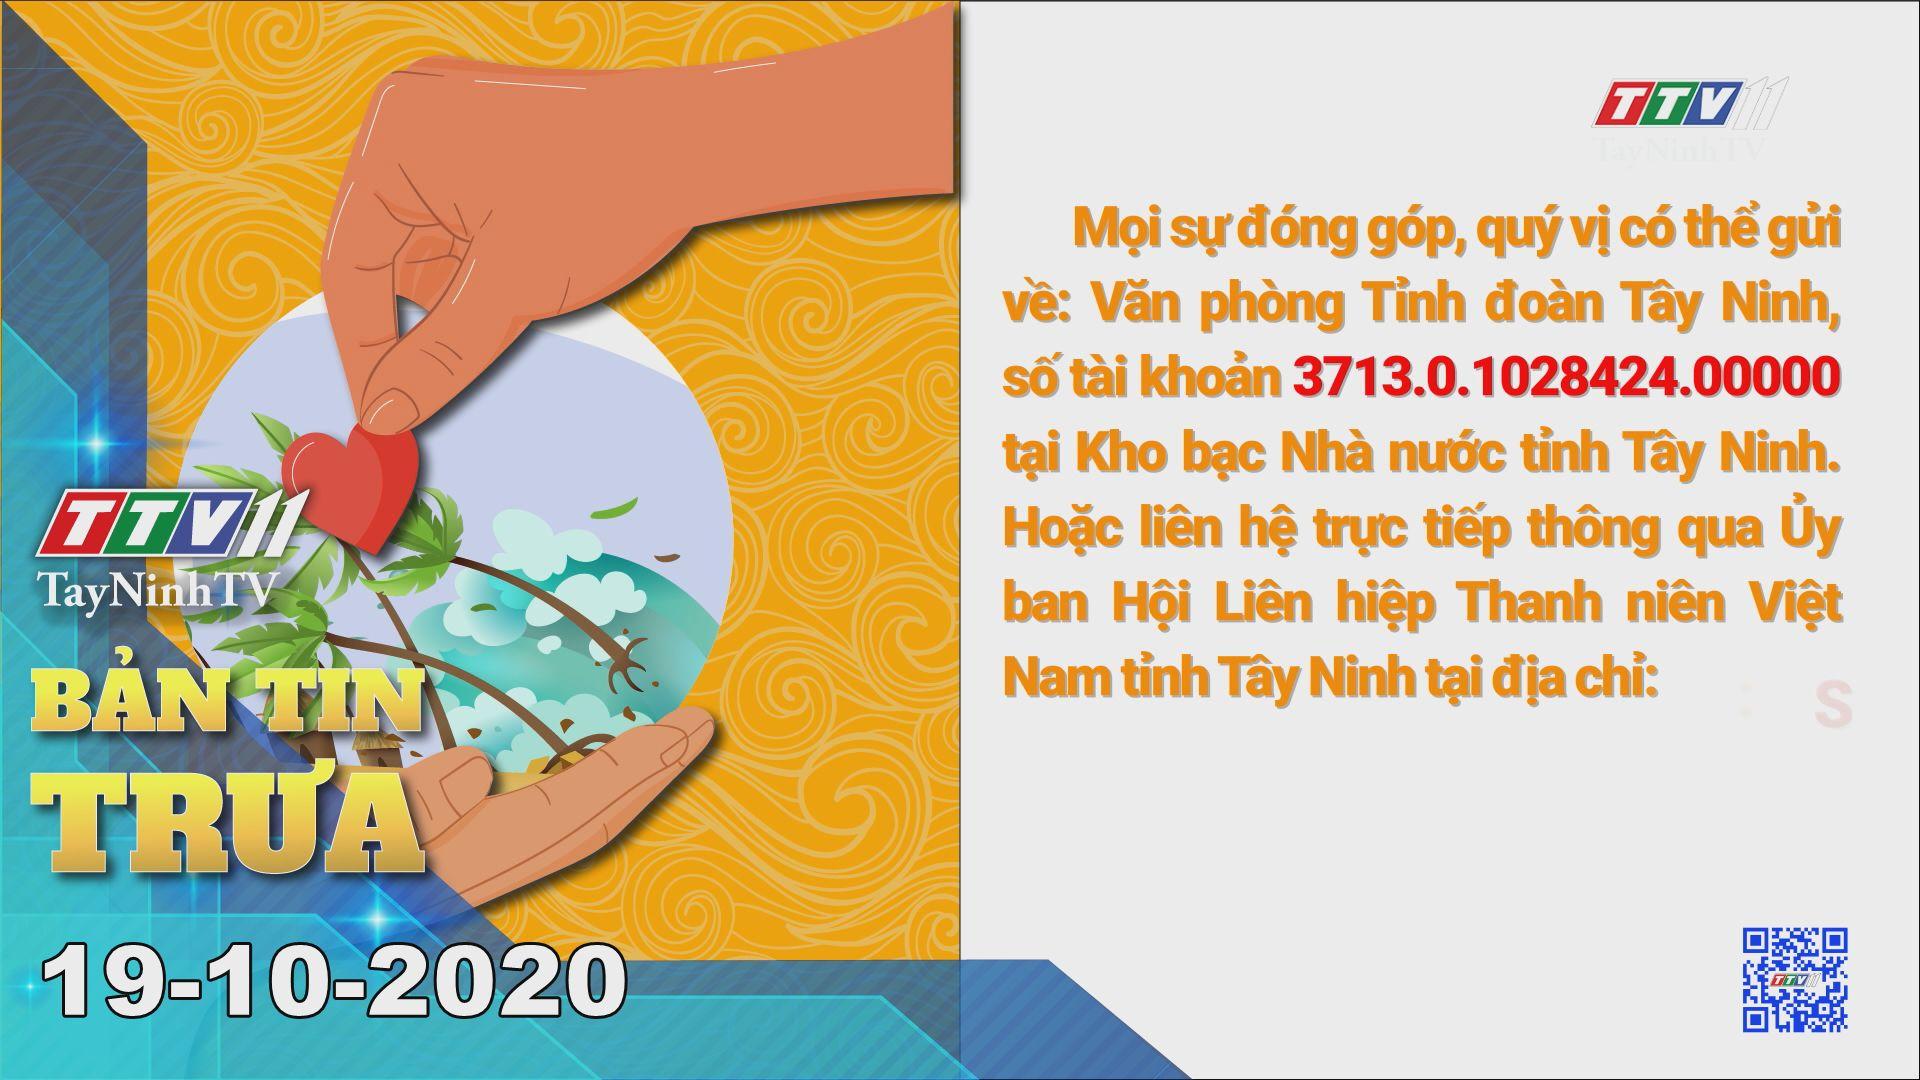 Bản tin trưa 19-10-2020 | Tin tức hôm nay | TayNinhTV